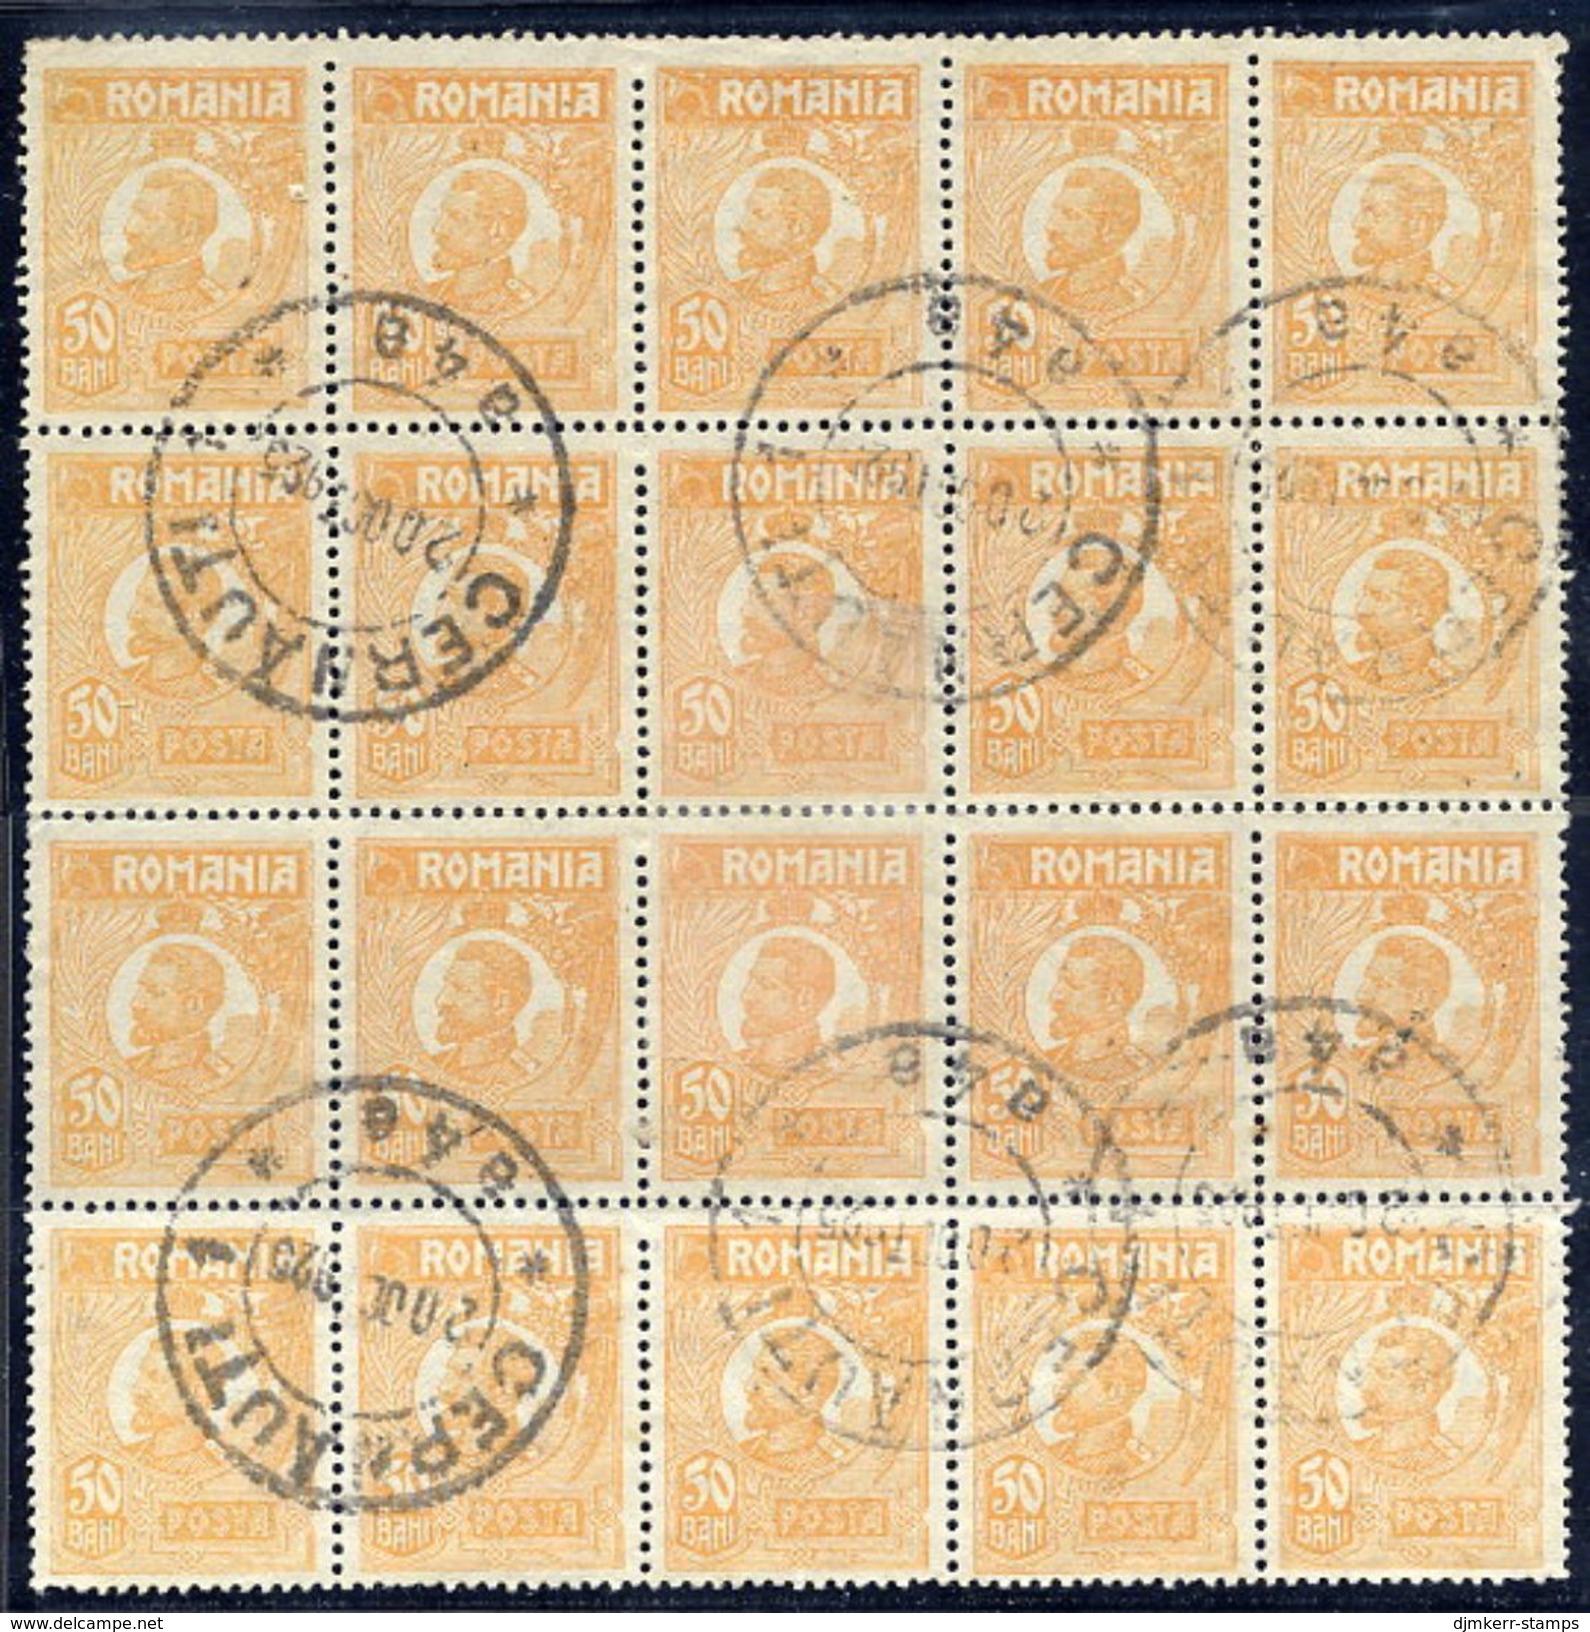 ROMANIA 1922 King Ferdinand 50 B. Type I In Used Block Of 20.  Michel 270 I - 1918-1948 Ferdinand, Charles II & Michael